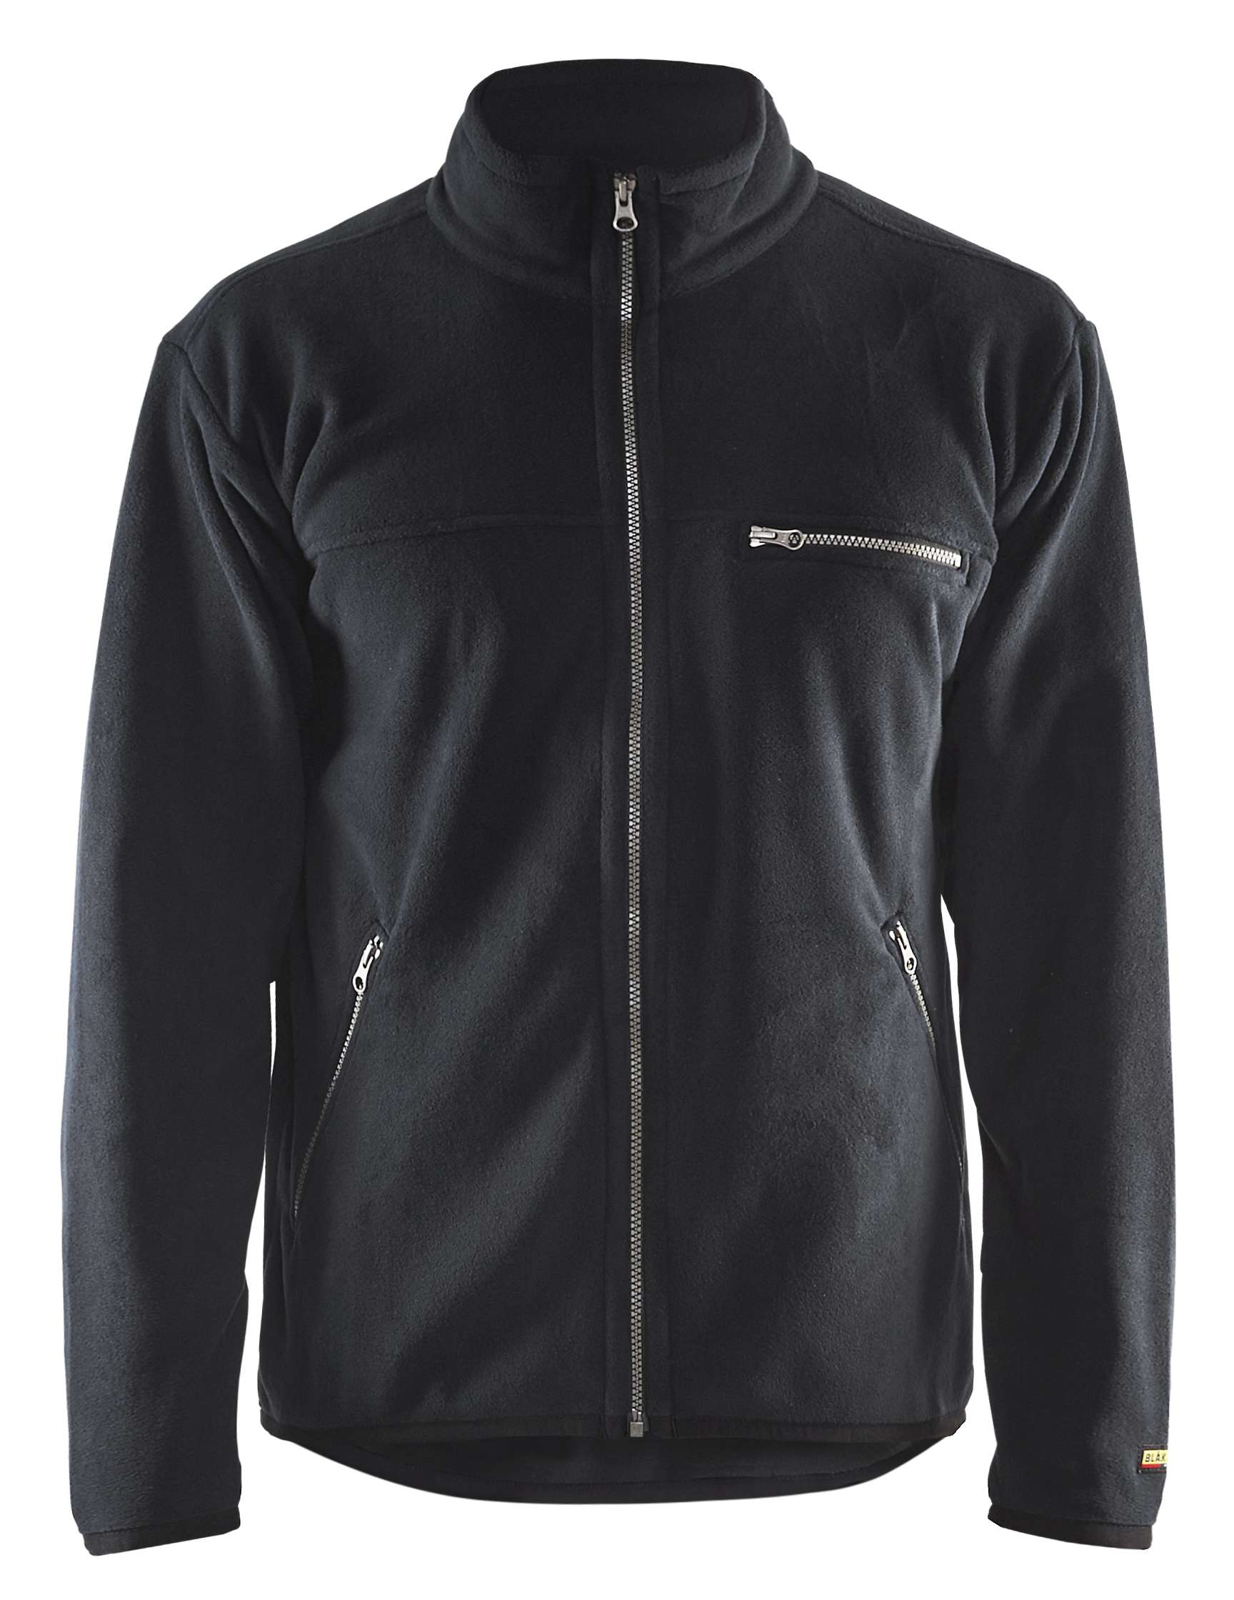 Blaklader Fleece vesten 48302510 zwart(9900)